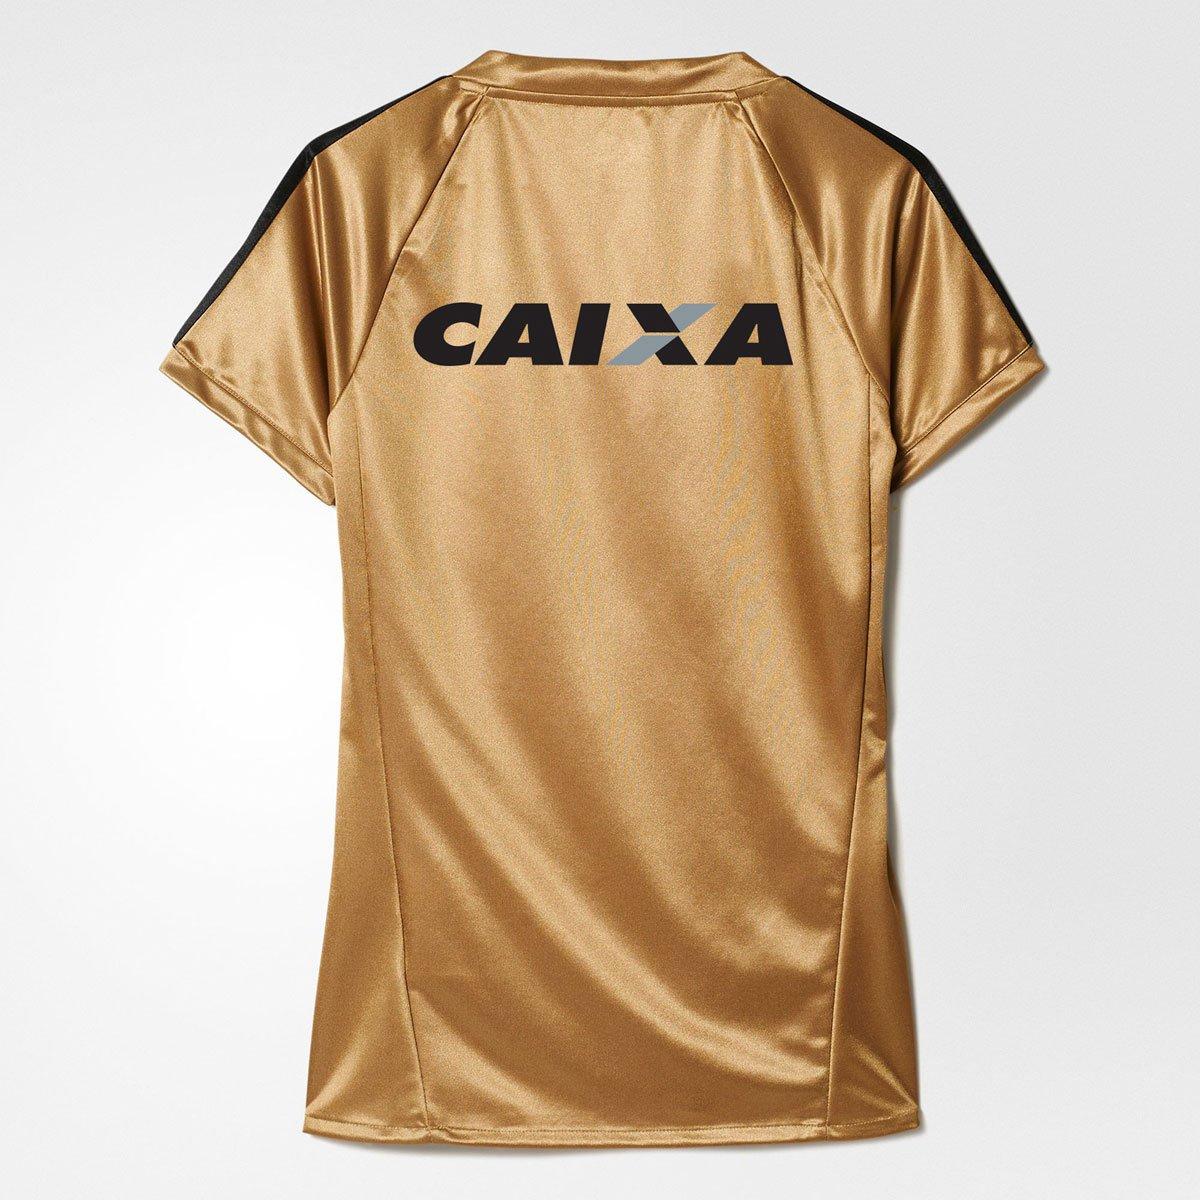 Camisa Sport Recife 2016 III s nº - Torcedor Adidas Feminina ... f672318e32431